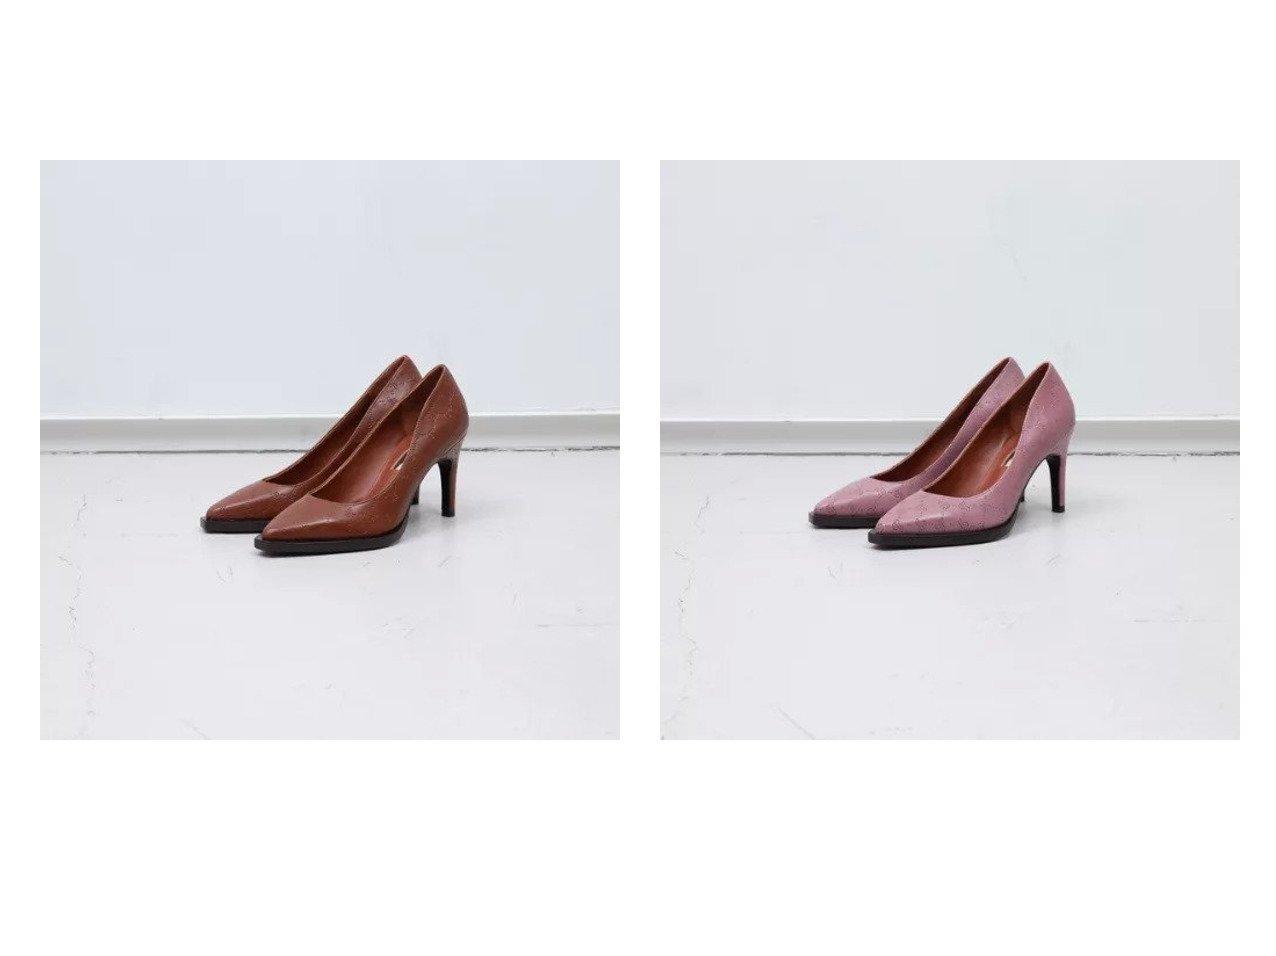 【Au BANNISTER/オゥ バニスター】のハイヒールコバパンプス シューズ・靴のおすすめ!人気、トレンド・レディースファッションの通販  おすすめで人気の流行・トレンド、ファッションの通販商品 メンズファッション・キッズファッション・インテリア・家具・レディースファッション・服の通販 founy(ファニー) https://founy.com/ ファッション Fashion レディースファッション WOMEN ウッド シューズ 人気 時計 |ID:crp329100000010857